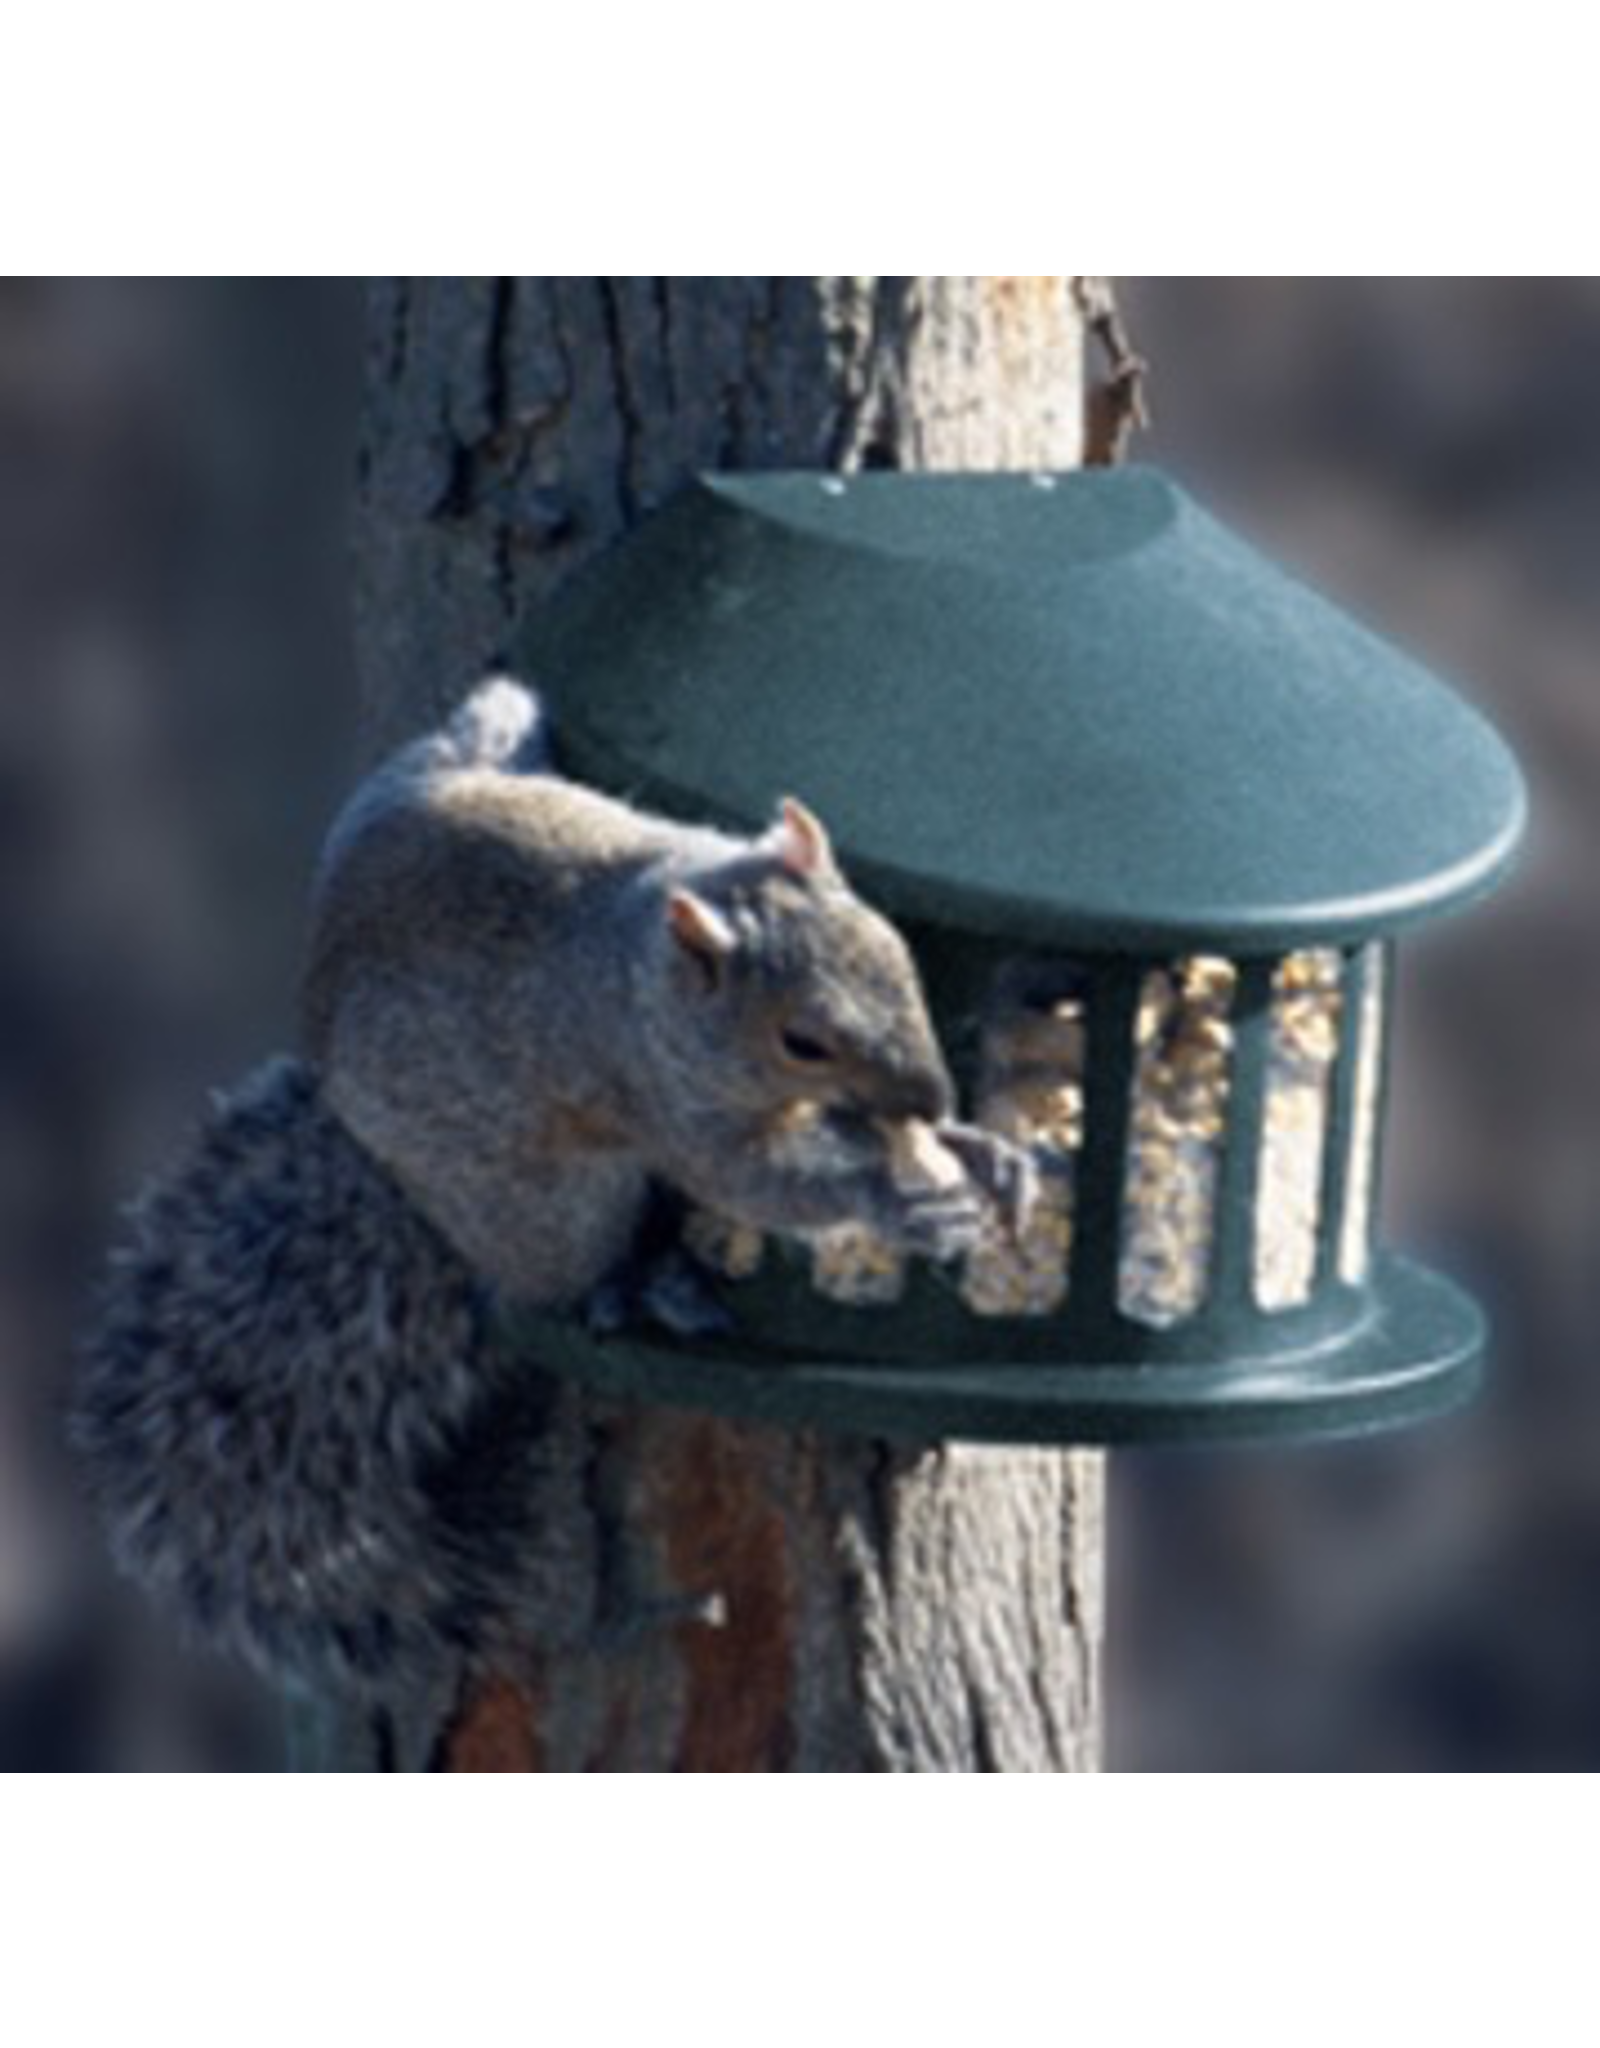 Woodlink PW75590 Metal Squirrel Feeder